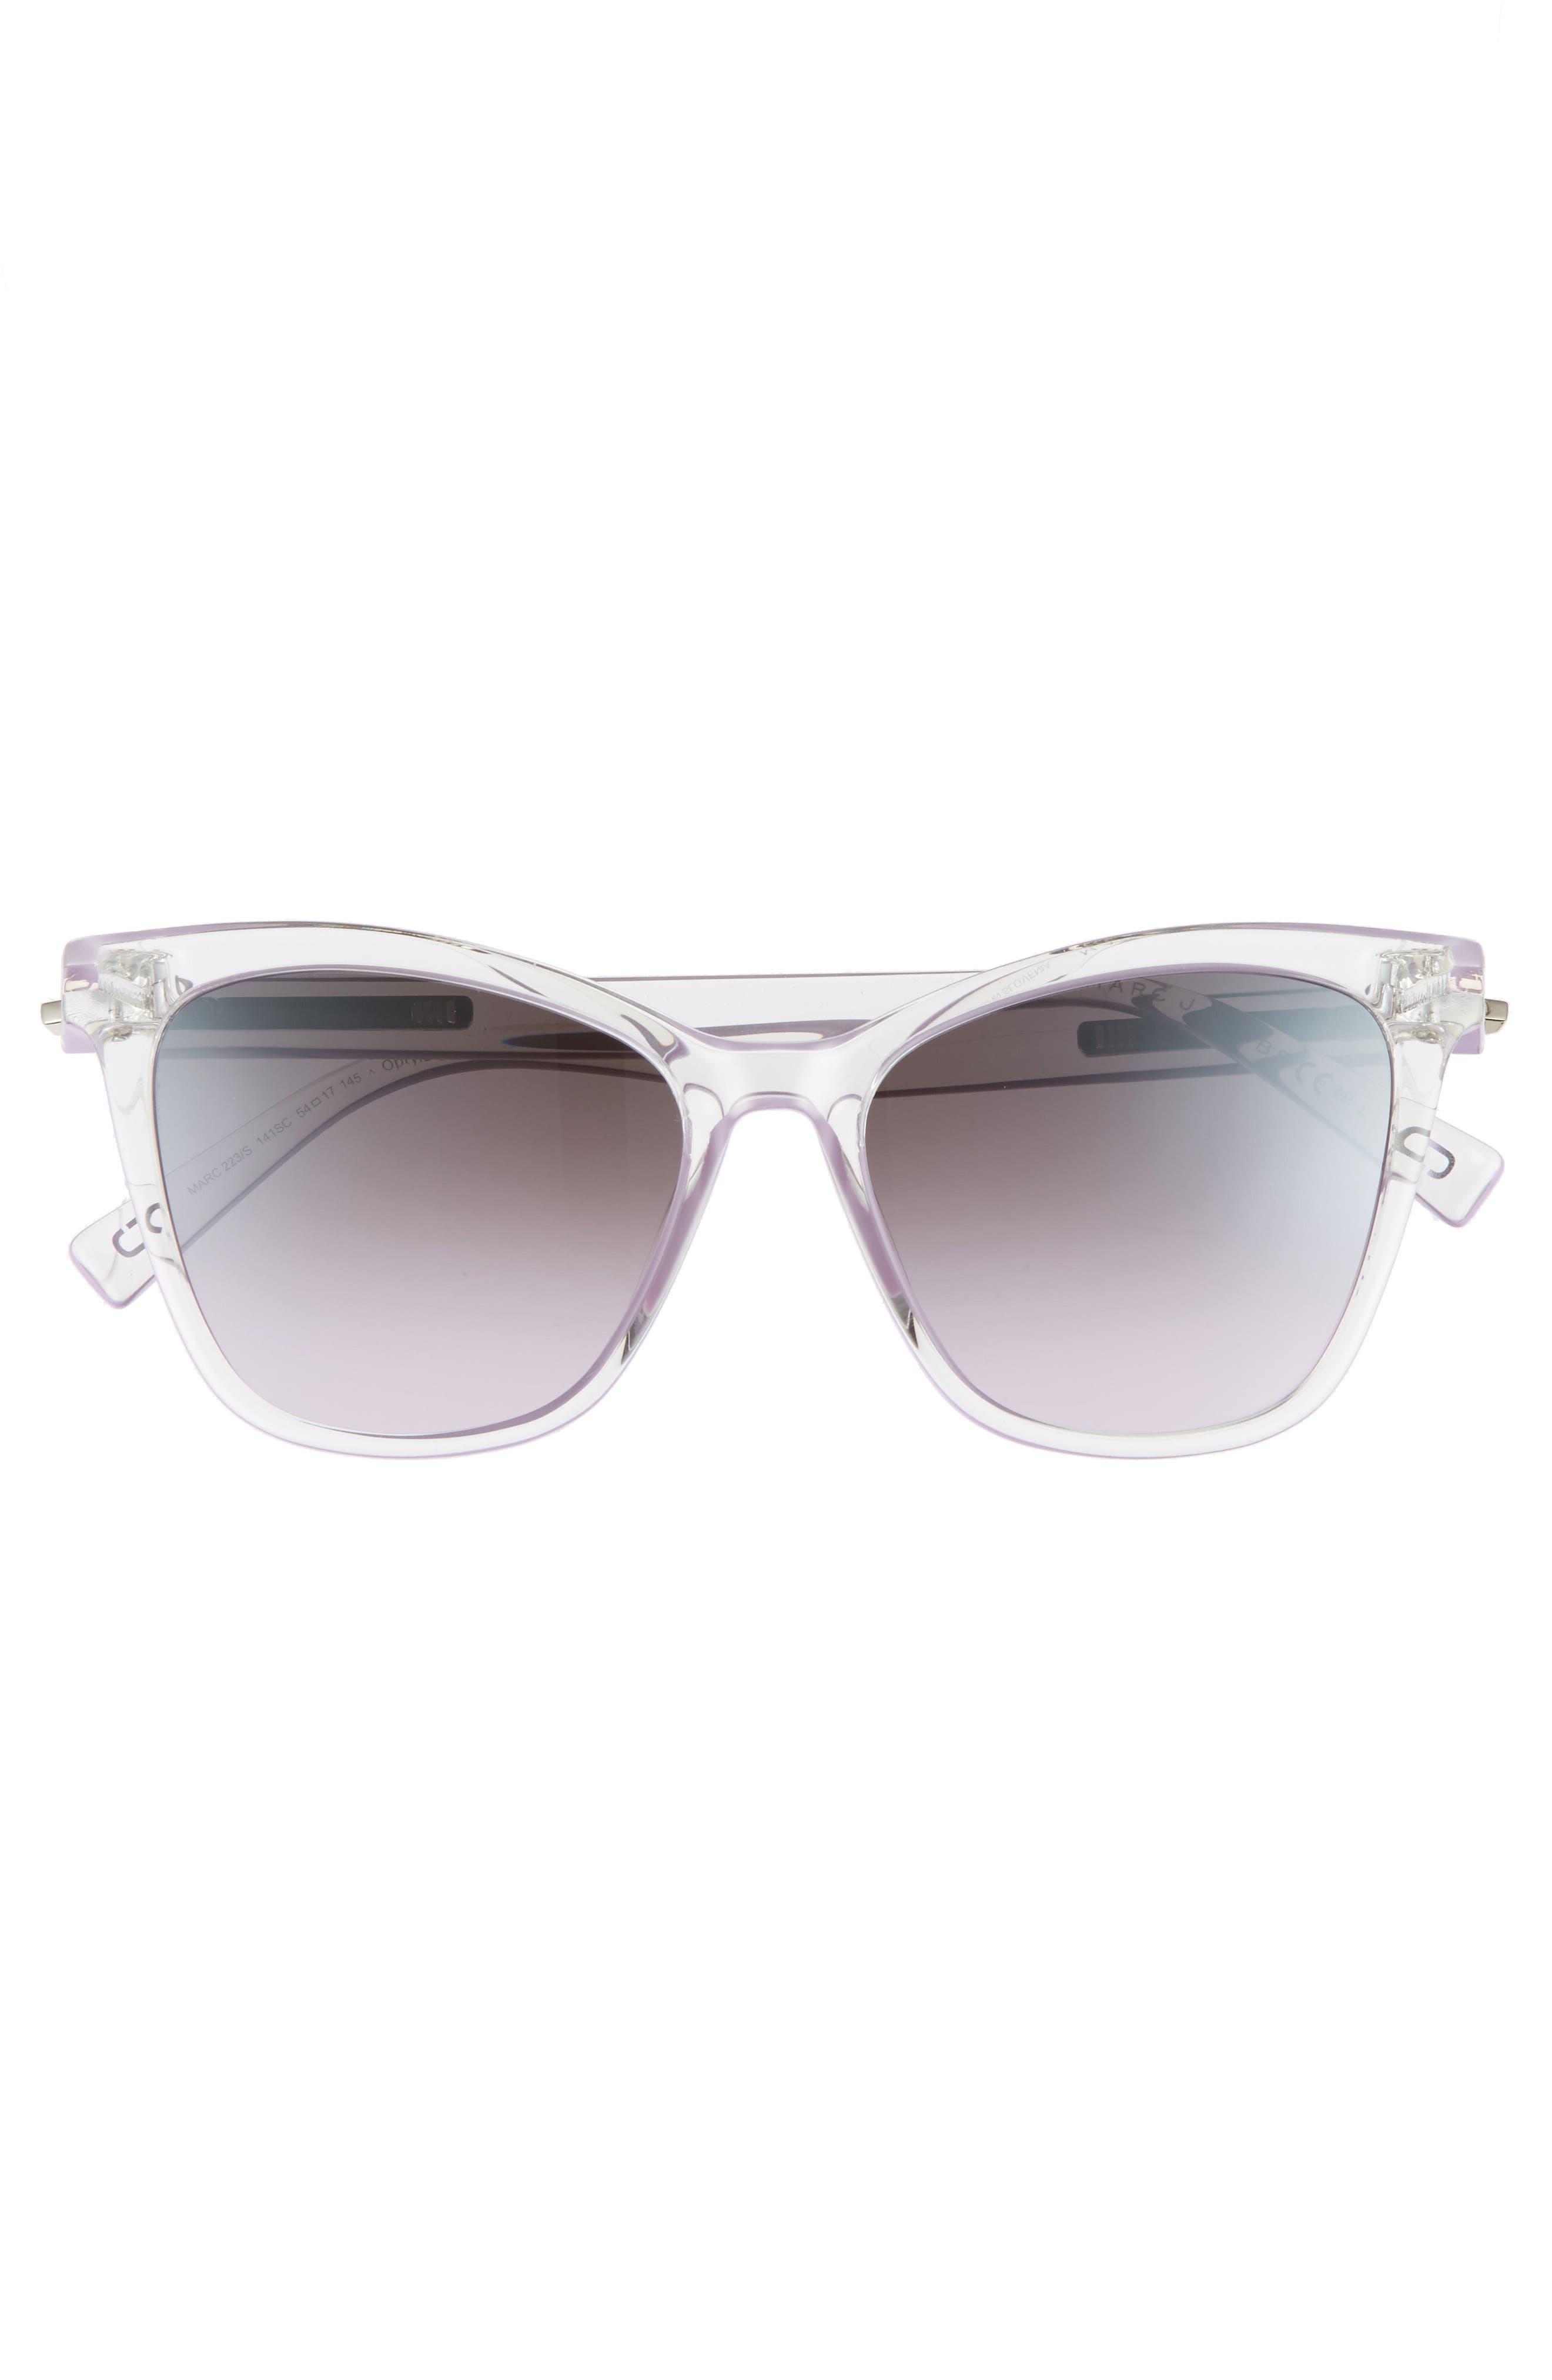 54mm Gradient Lens Sunglasses,                             Alternate thumbnail 3, color,                             Crystal Clear Violet